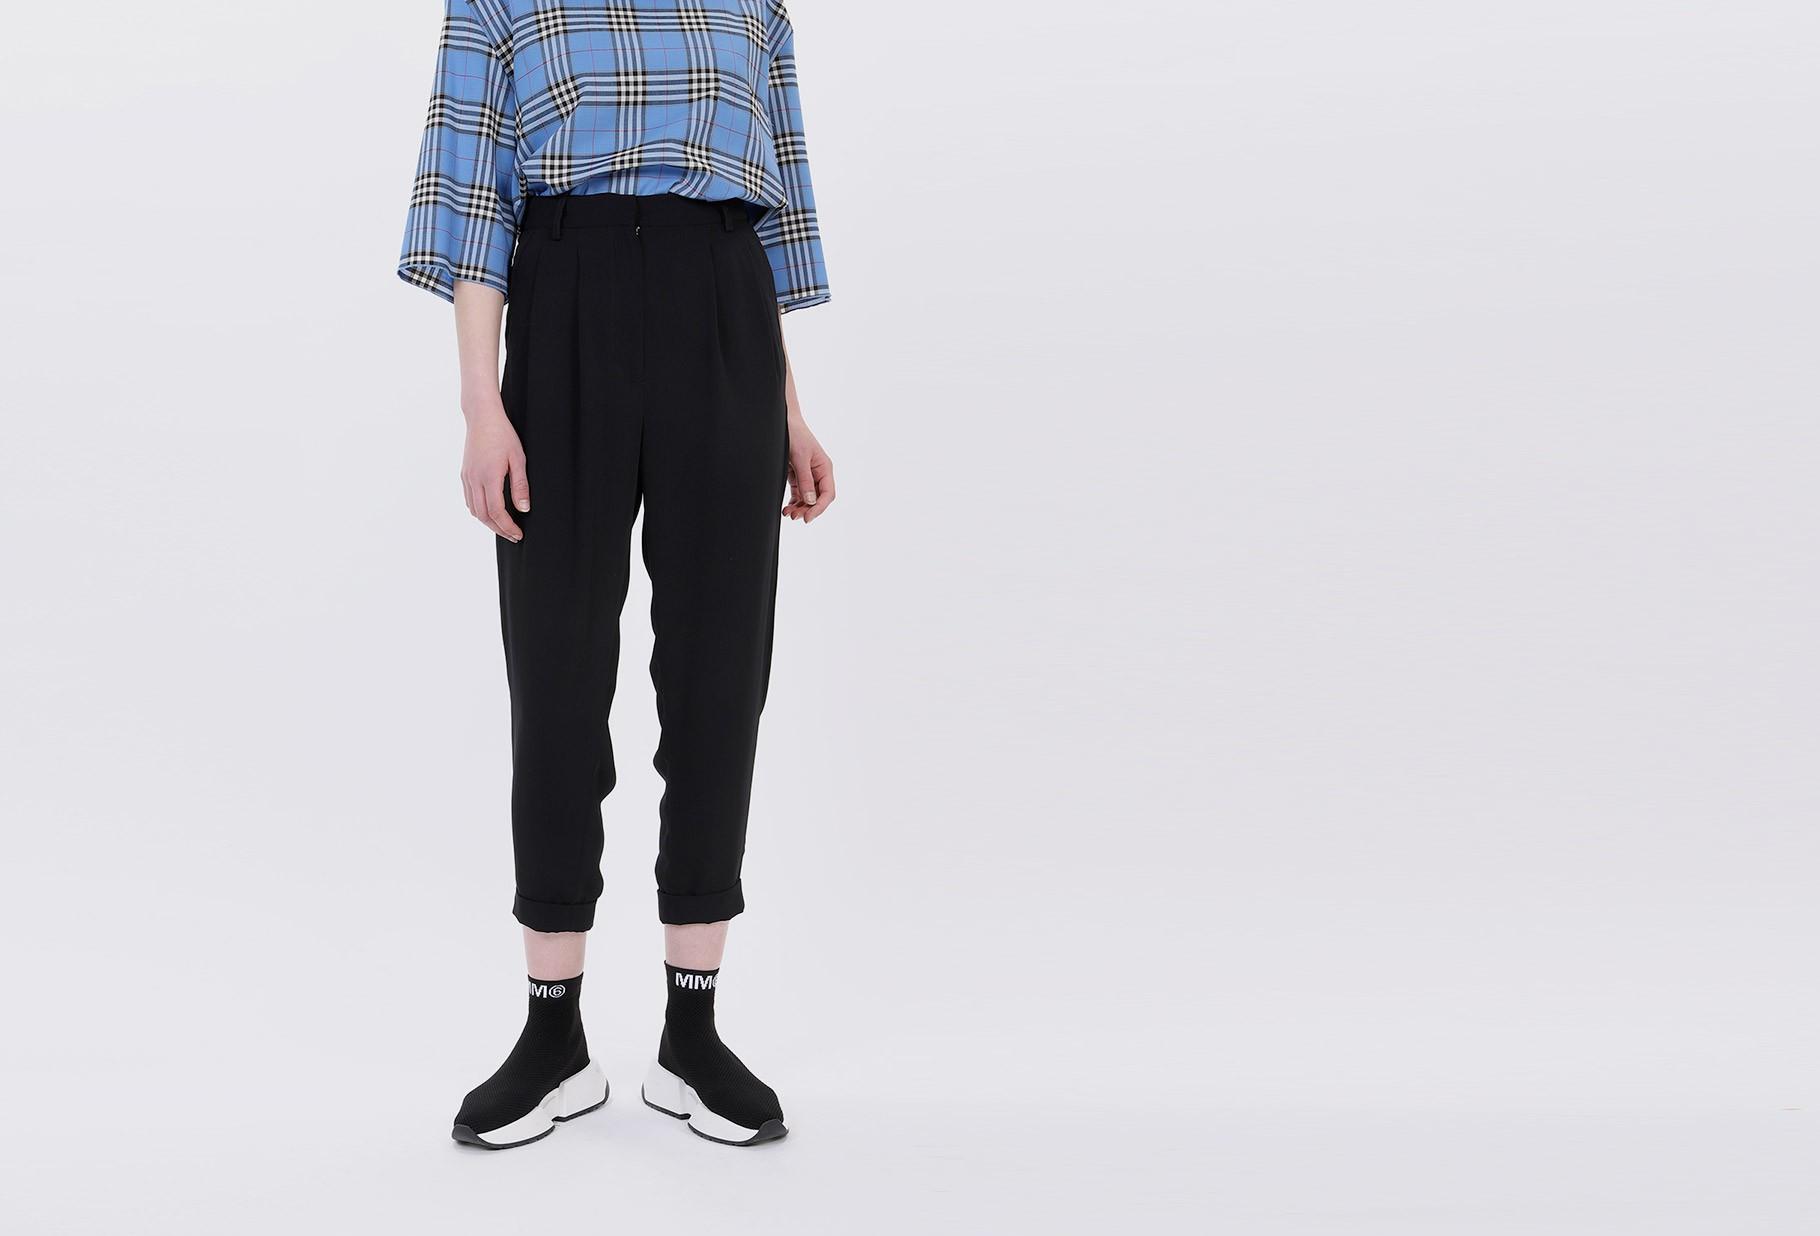 MM6 MAISON MARGIELA FOR WOMAN / Tapered trouser Black